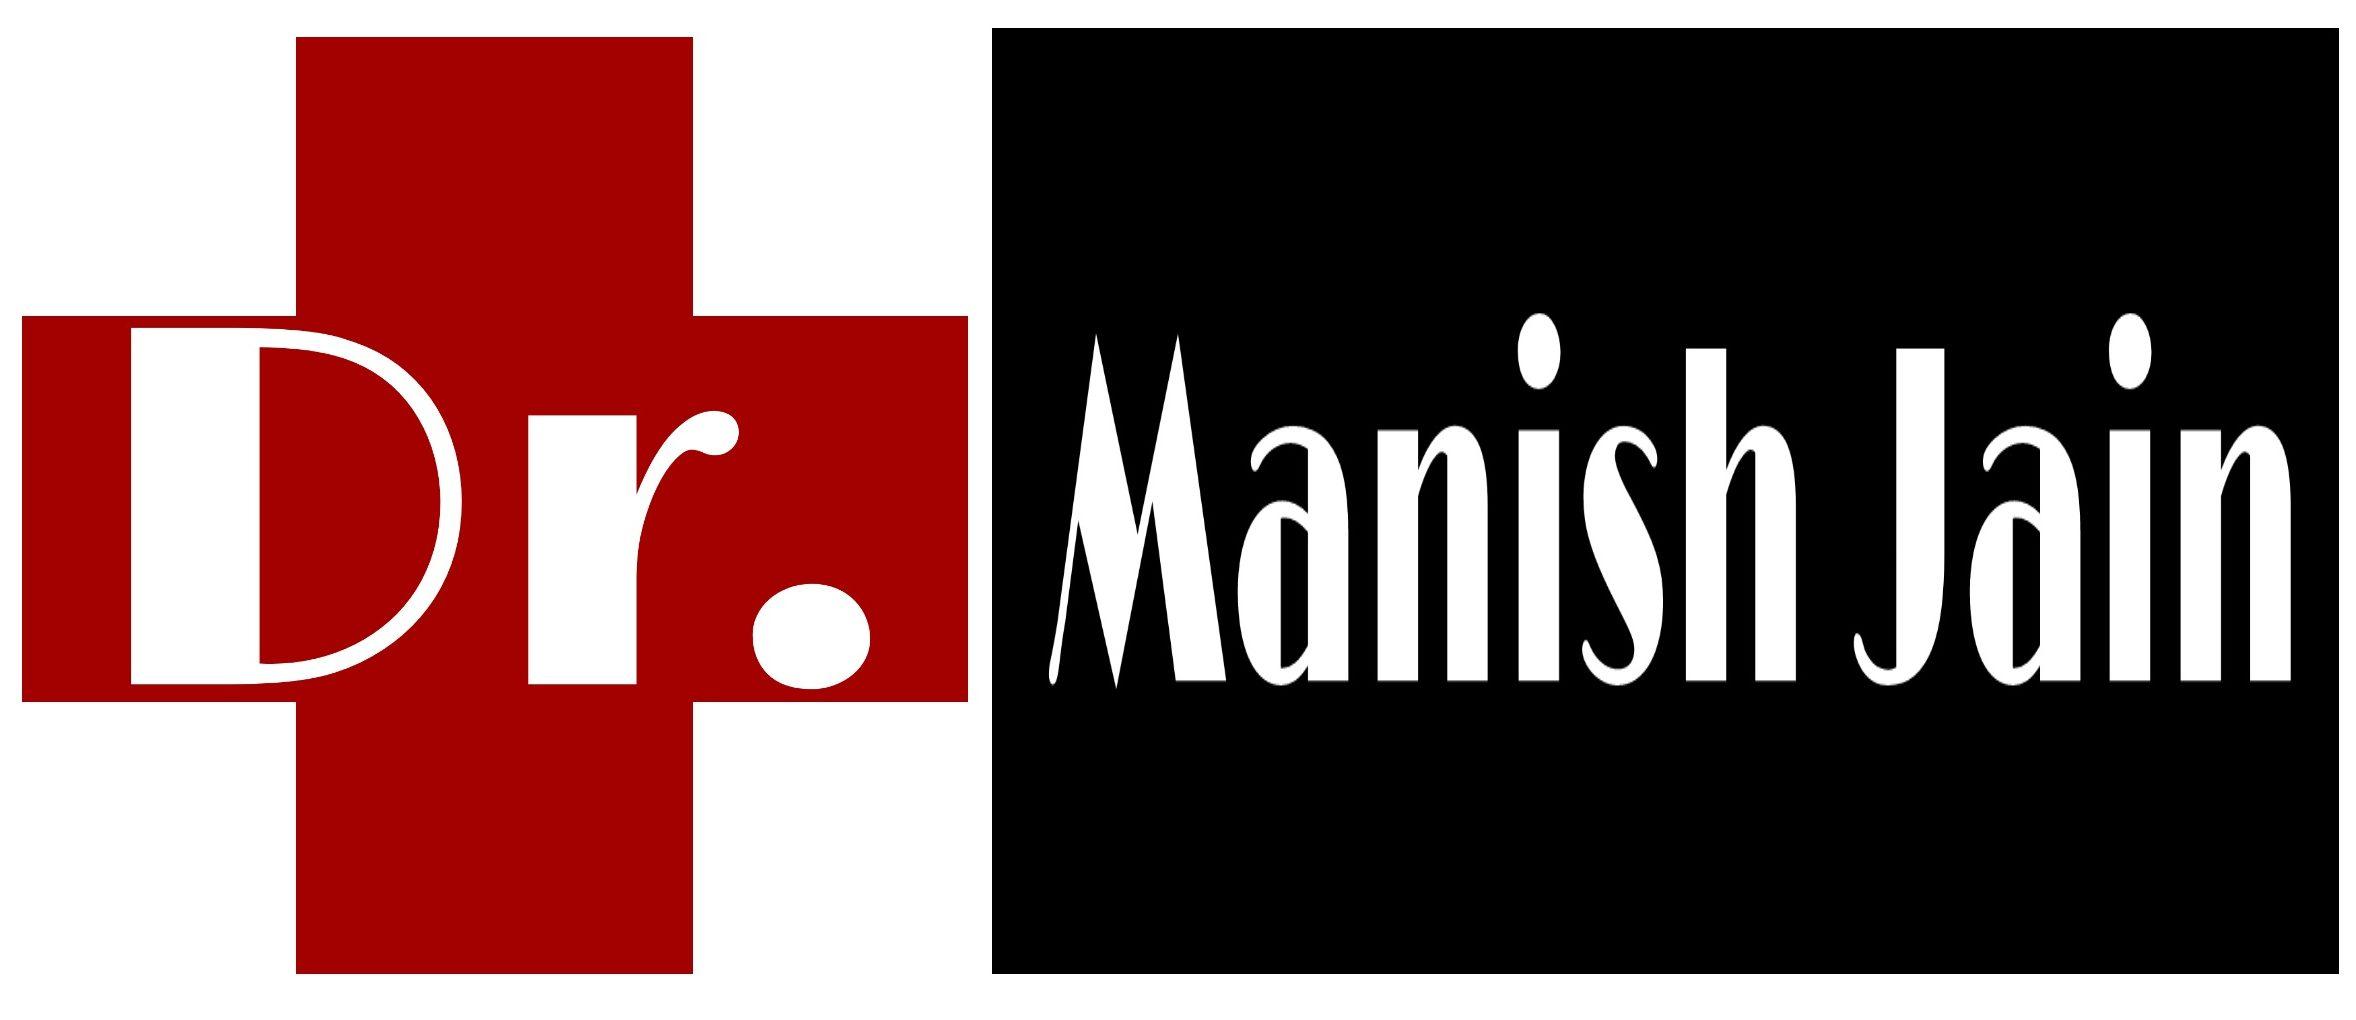 Dr. Manish Jain | TeleMedicine | Doctor near me